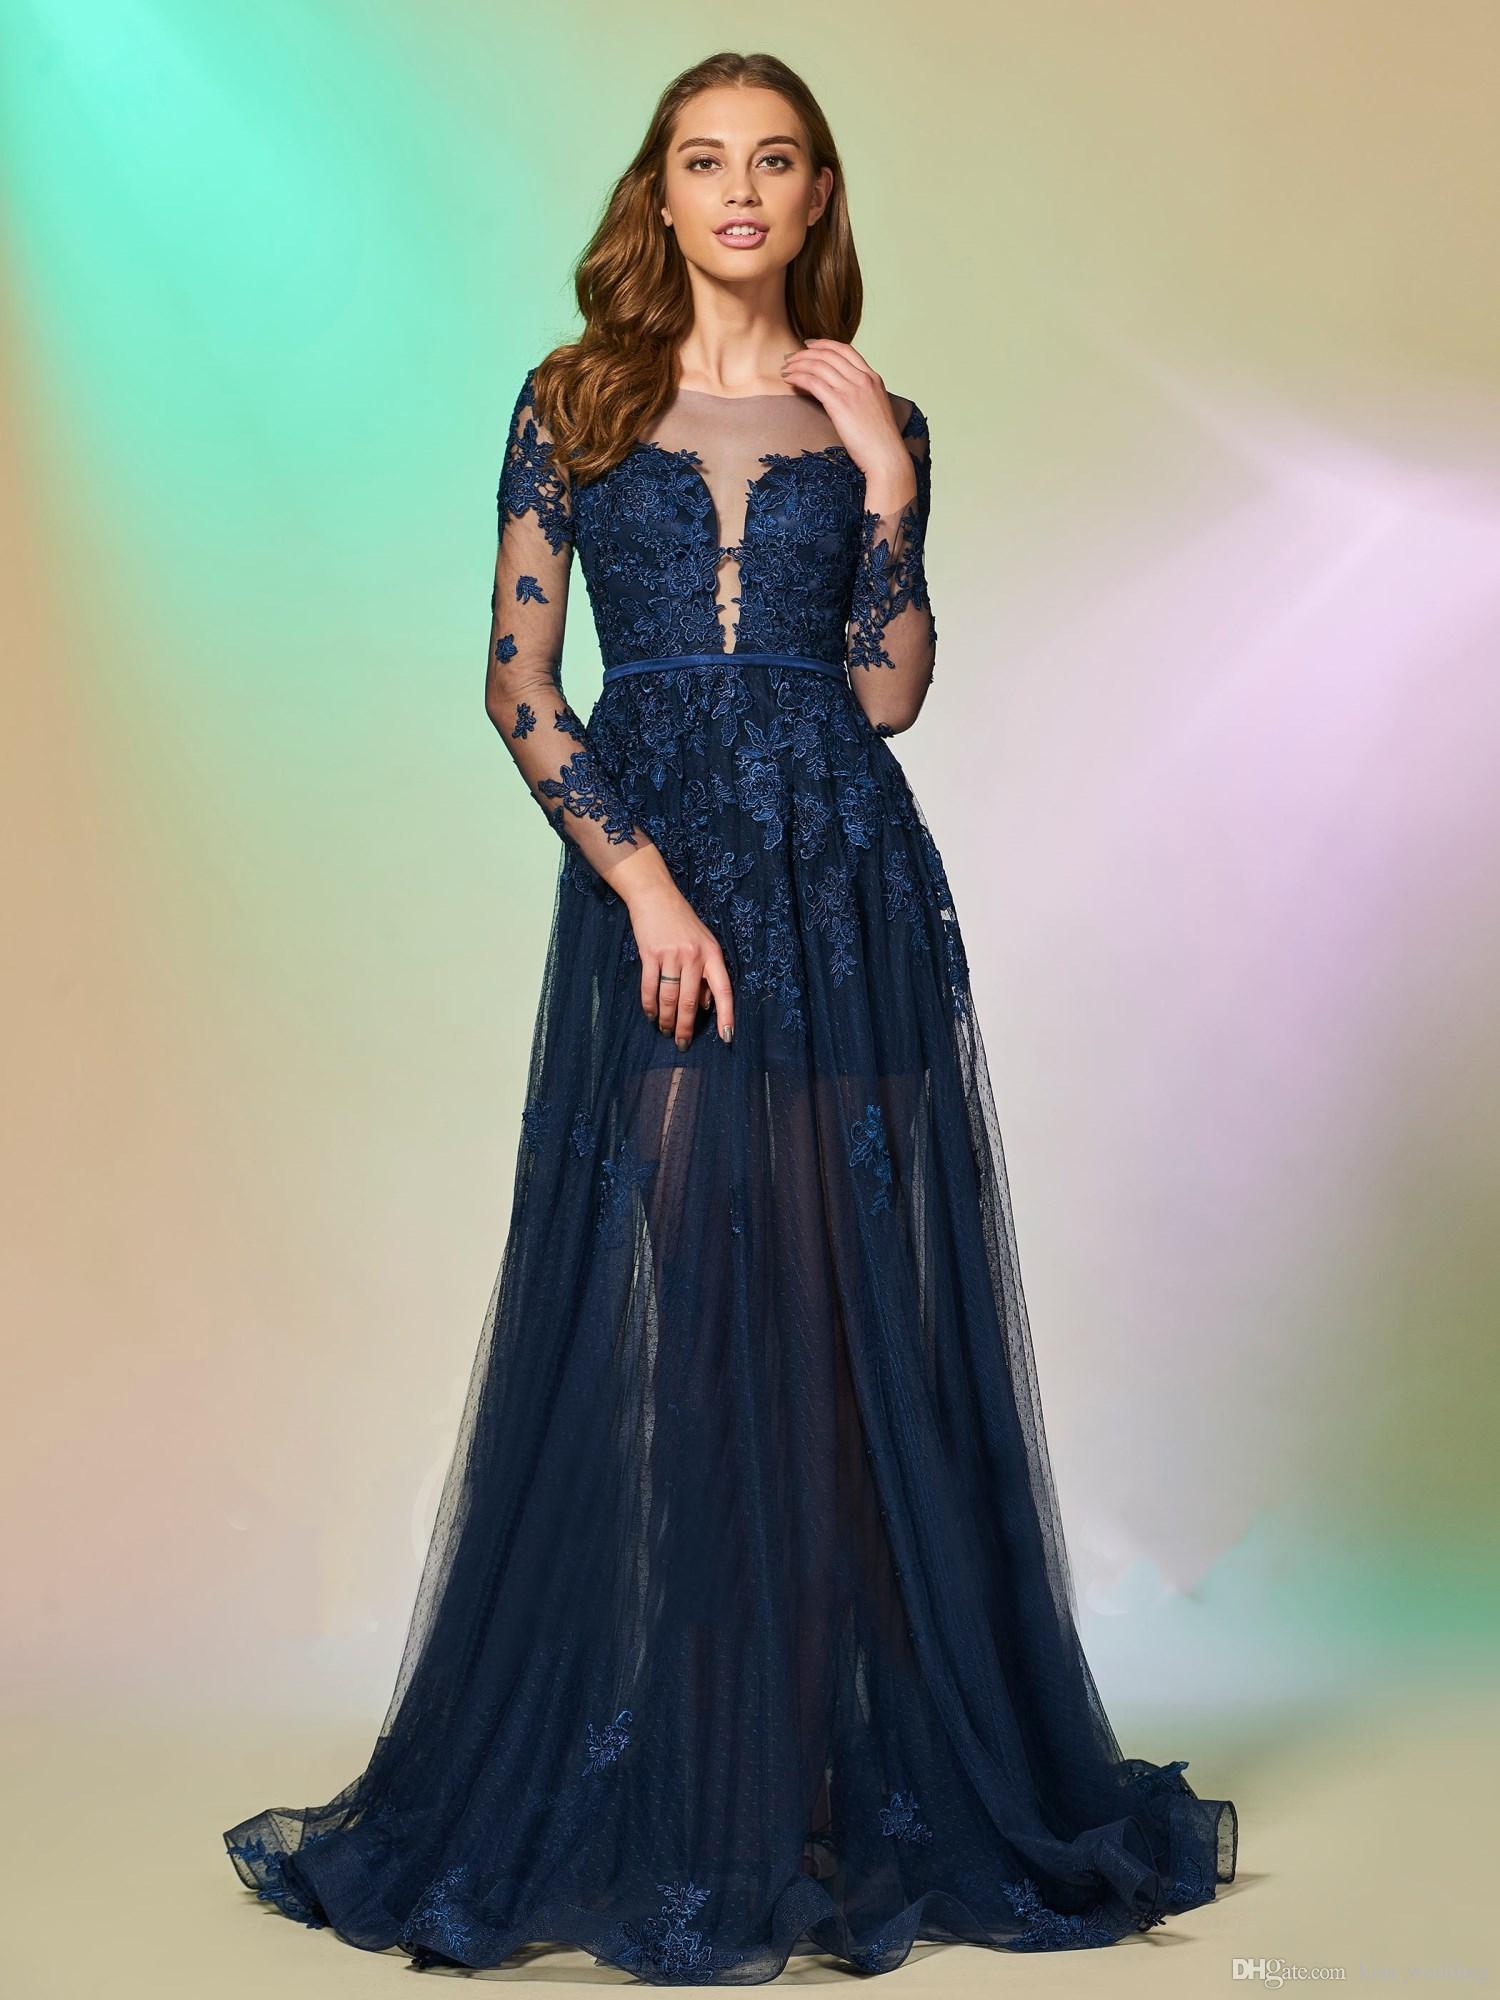 Schön Abend Kleid Dunkel Blau Stylish20 Genial Abend Kleid Dunkel Blau Vertrieb